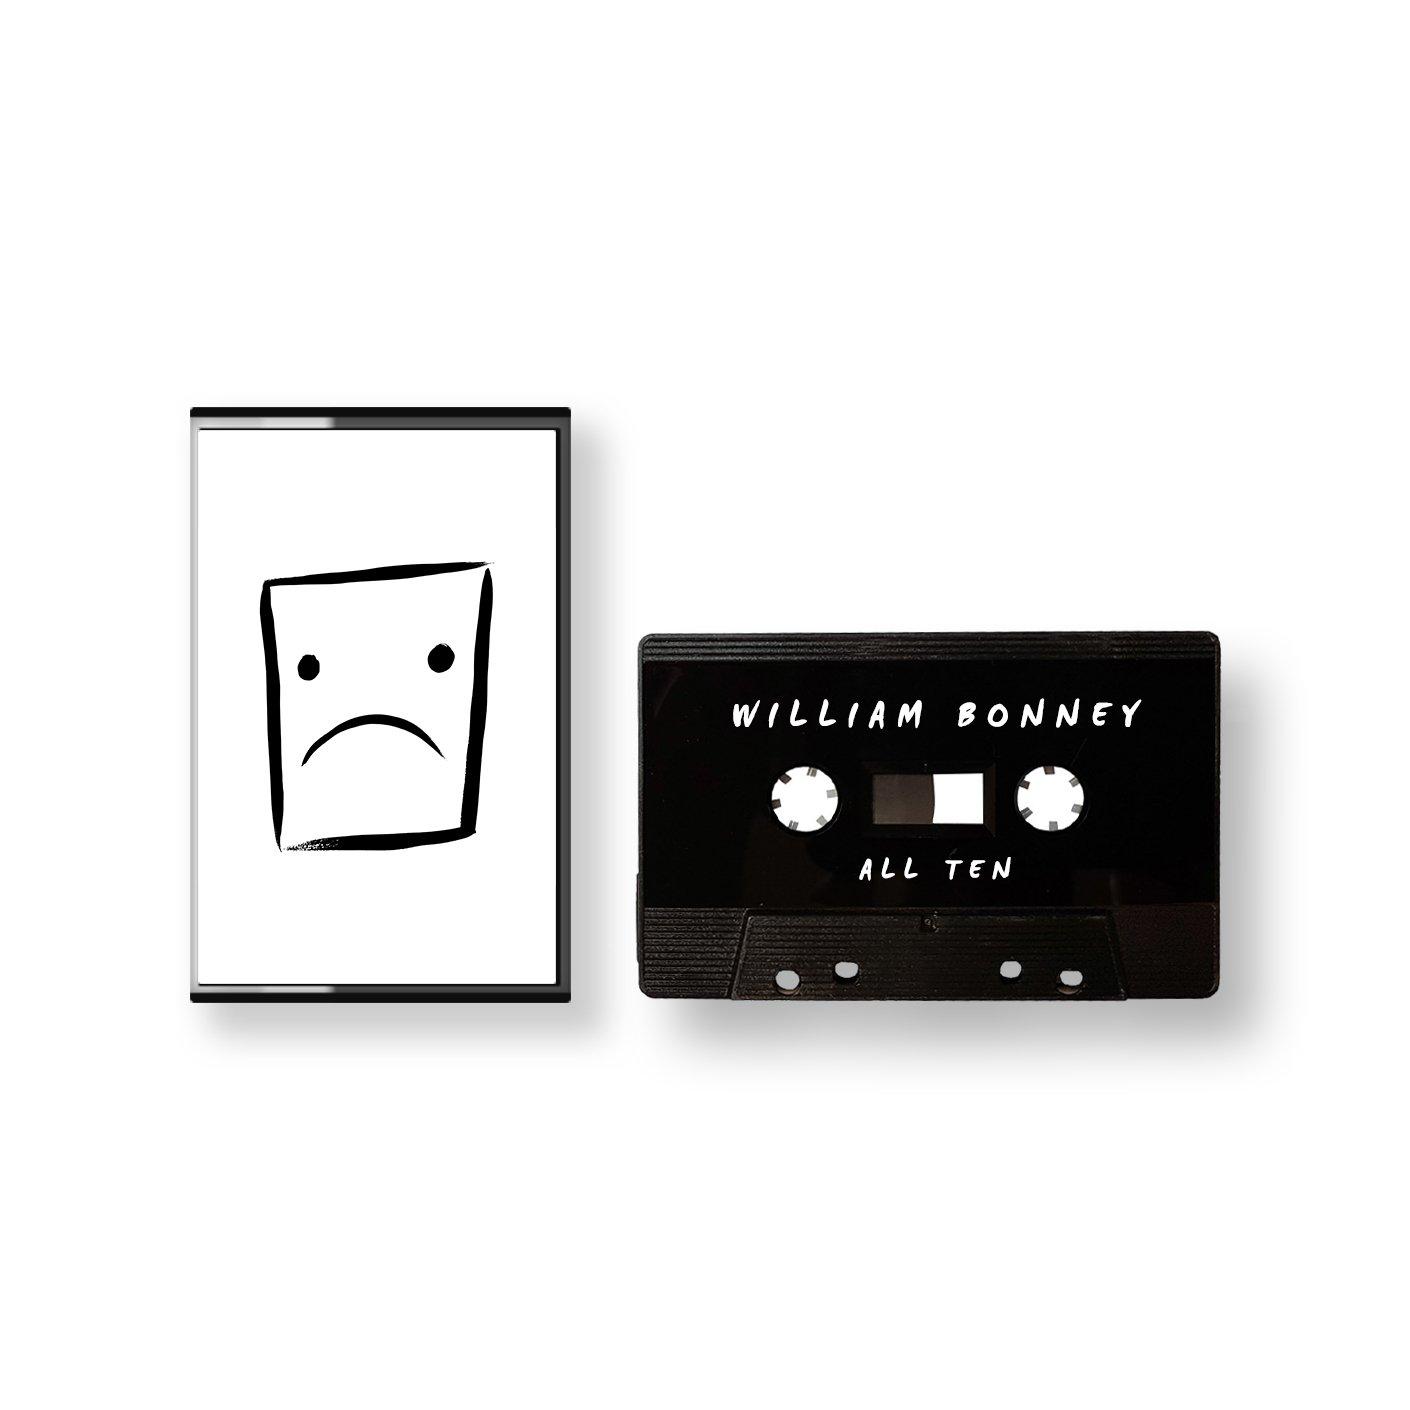 william-bonney-tape-mock_2000x.jpg